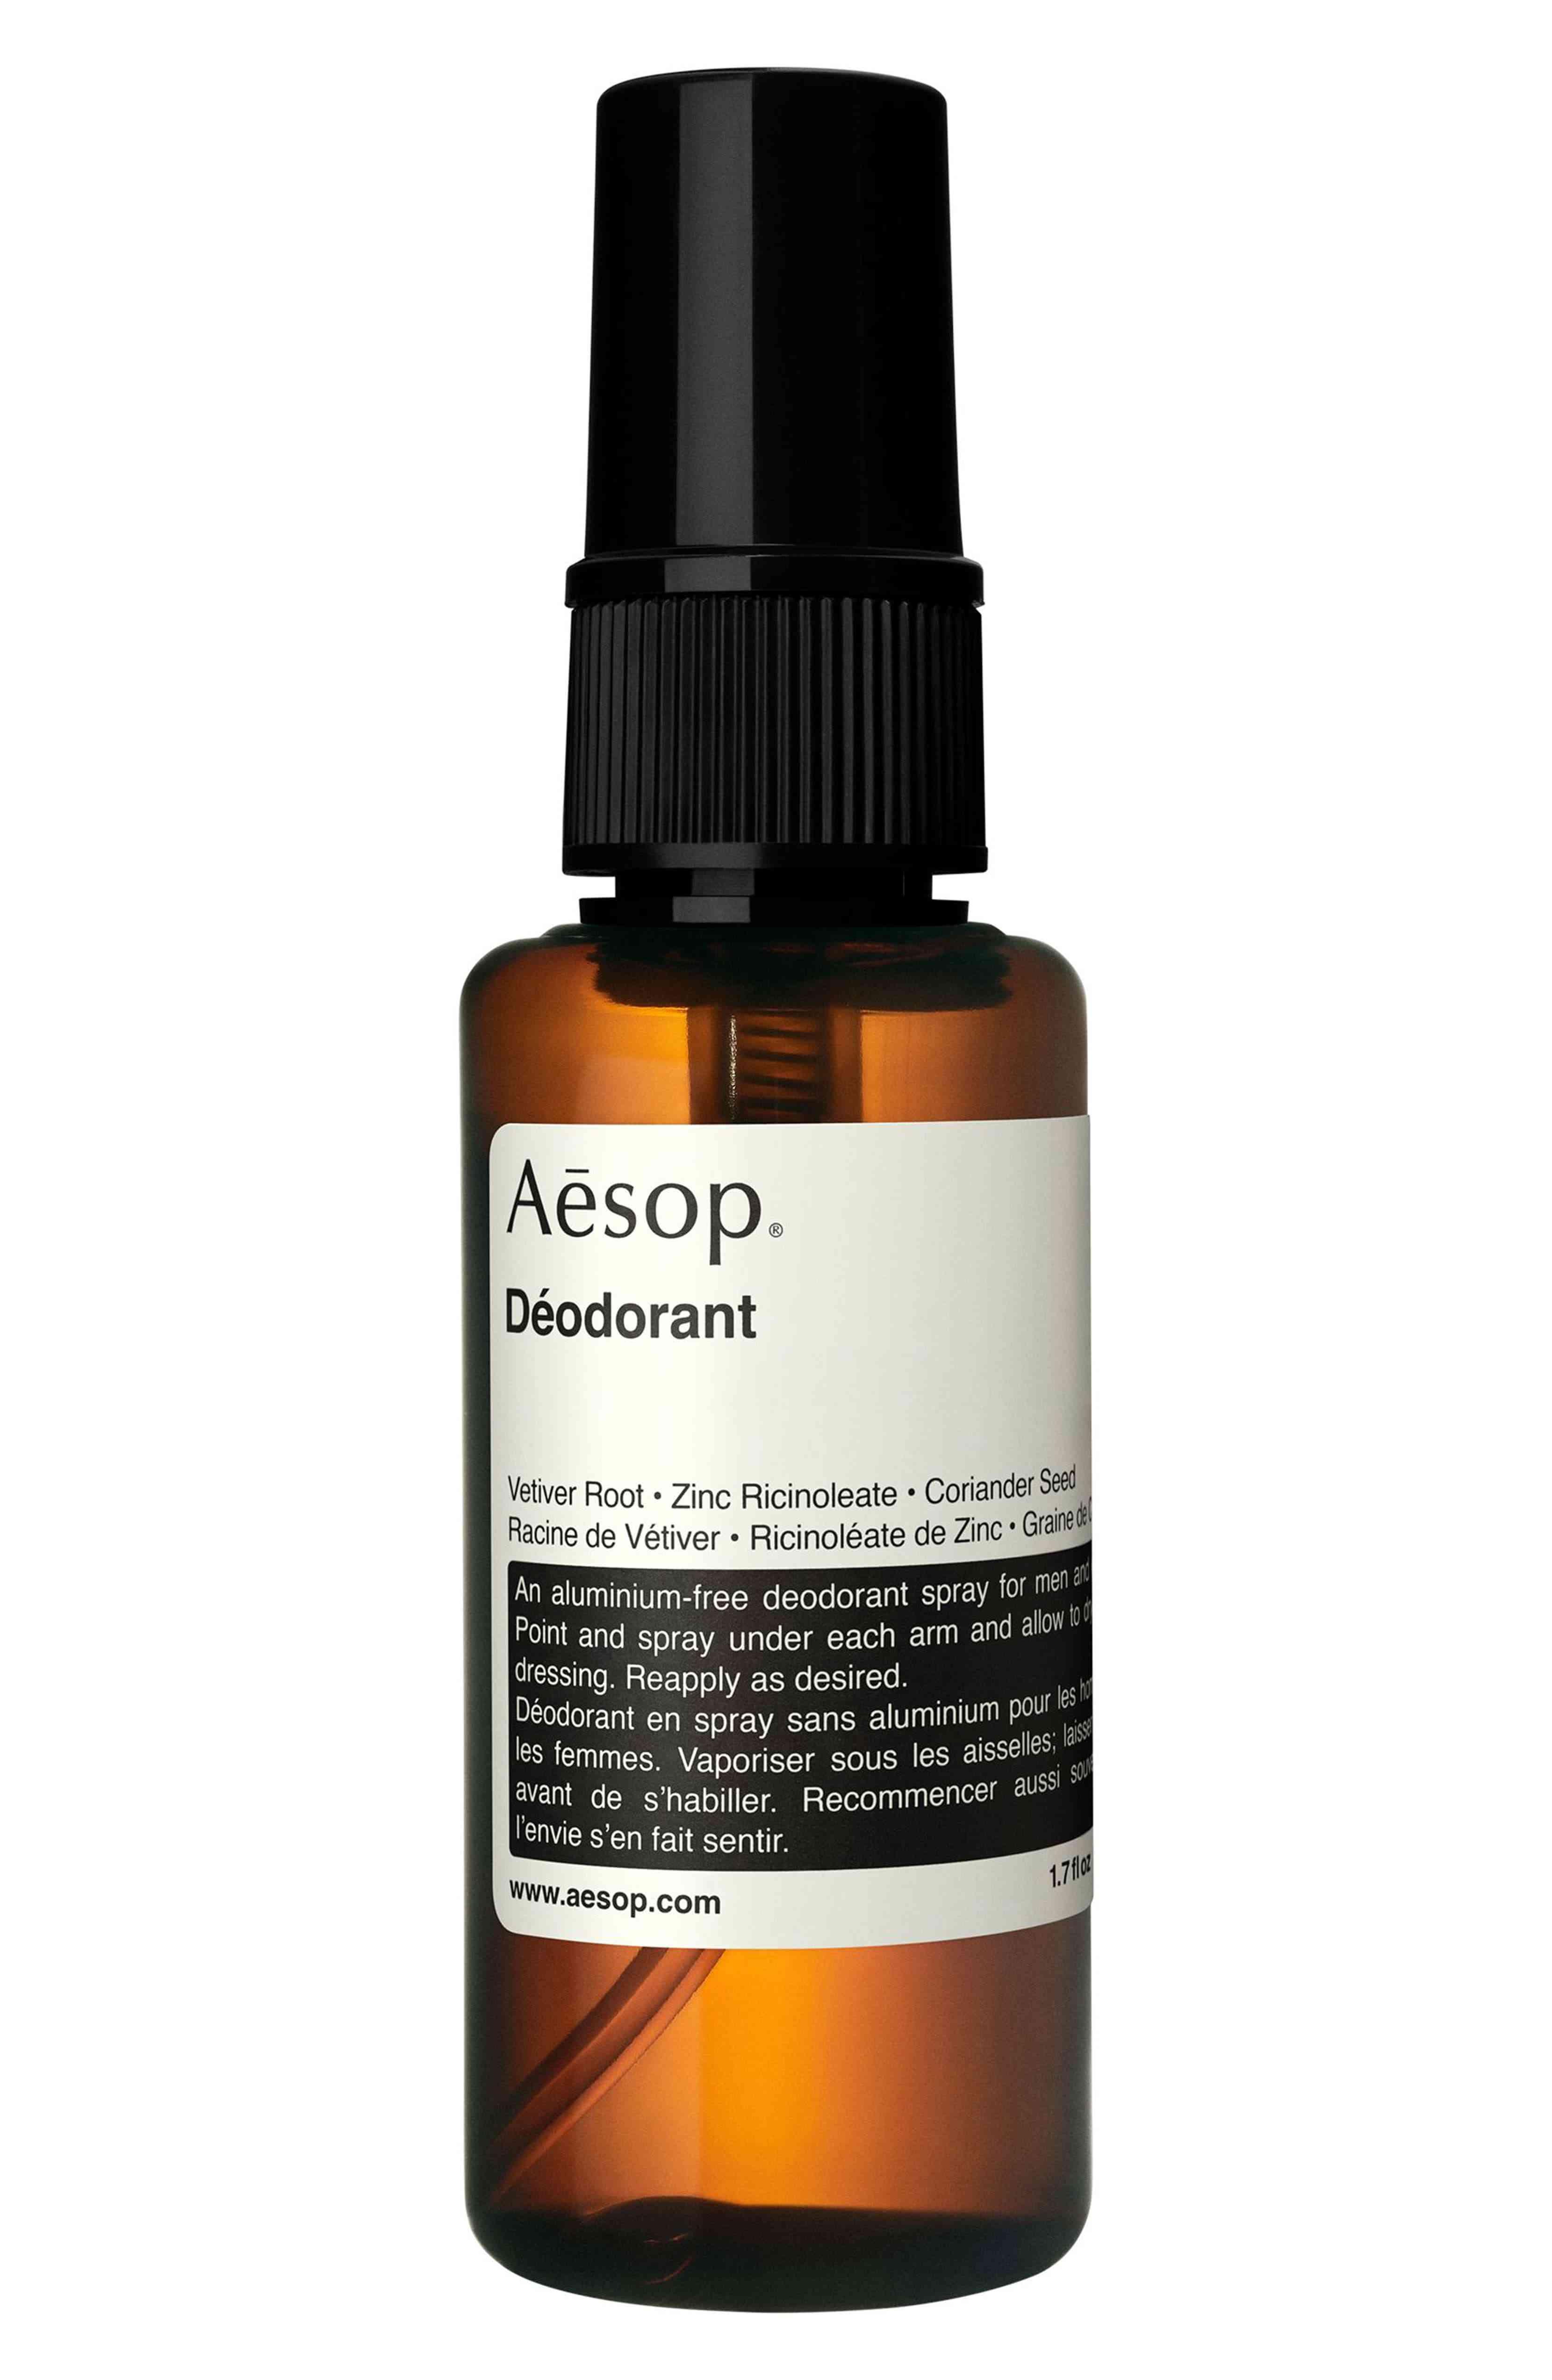 aesop deodorant spray